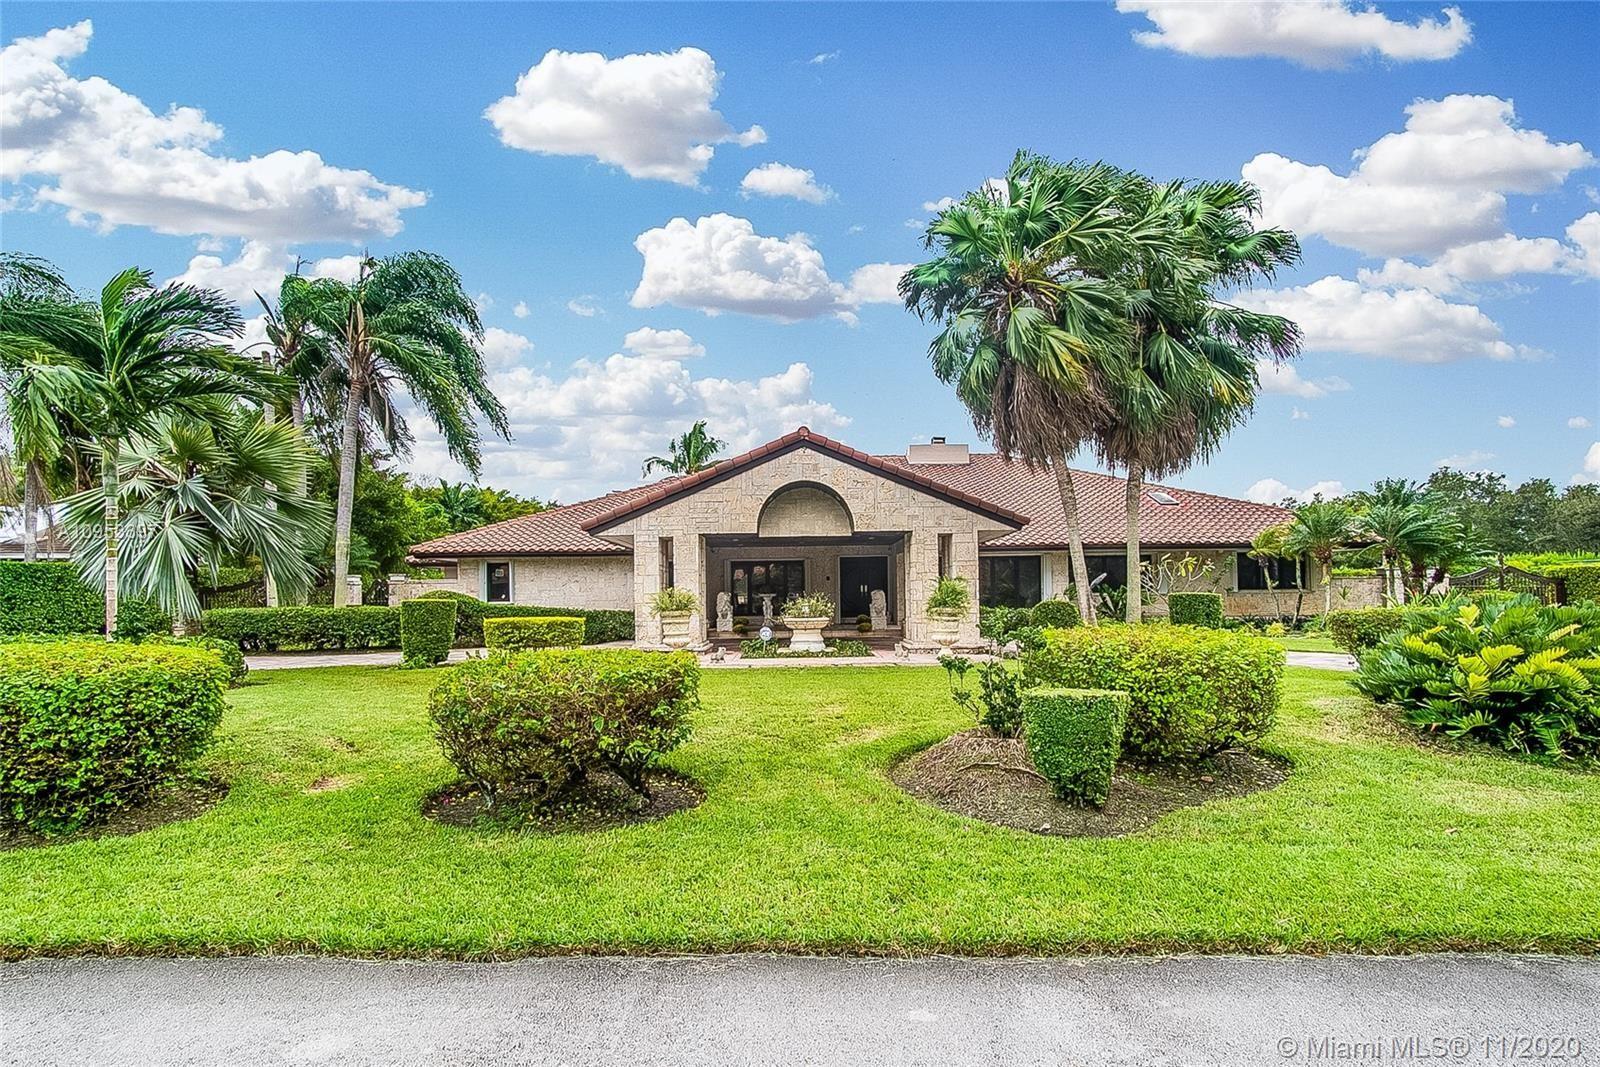 9100 SW 103rd St, Miami, FL 33176 - #: A10953397